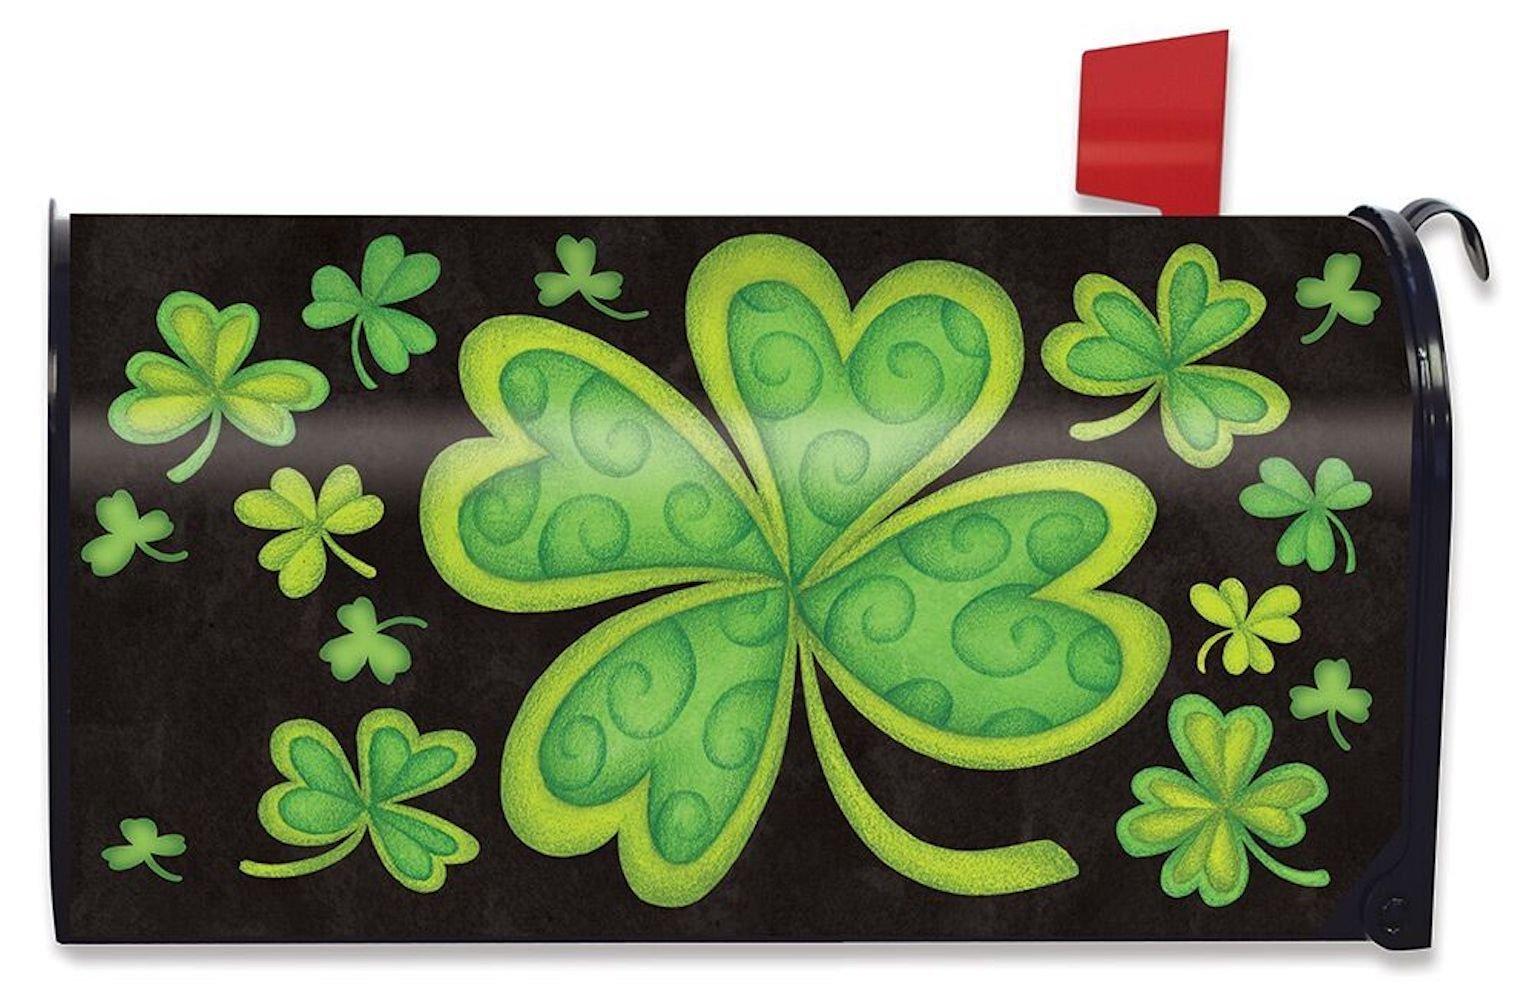 Briarwood Lane Happy St. Patrick's Day Magnetic Mailbox Cover Shamrocks Standard